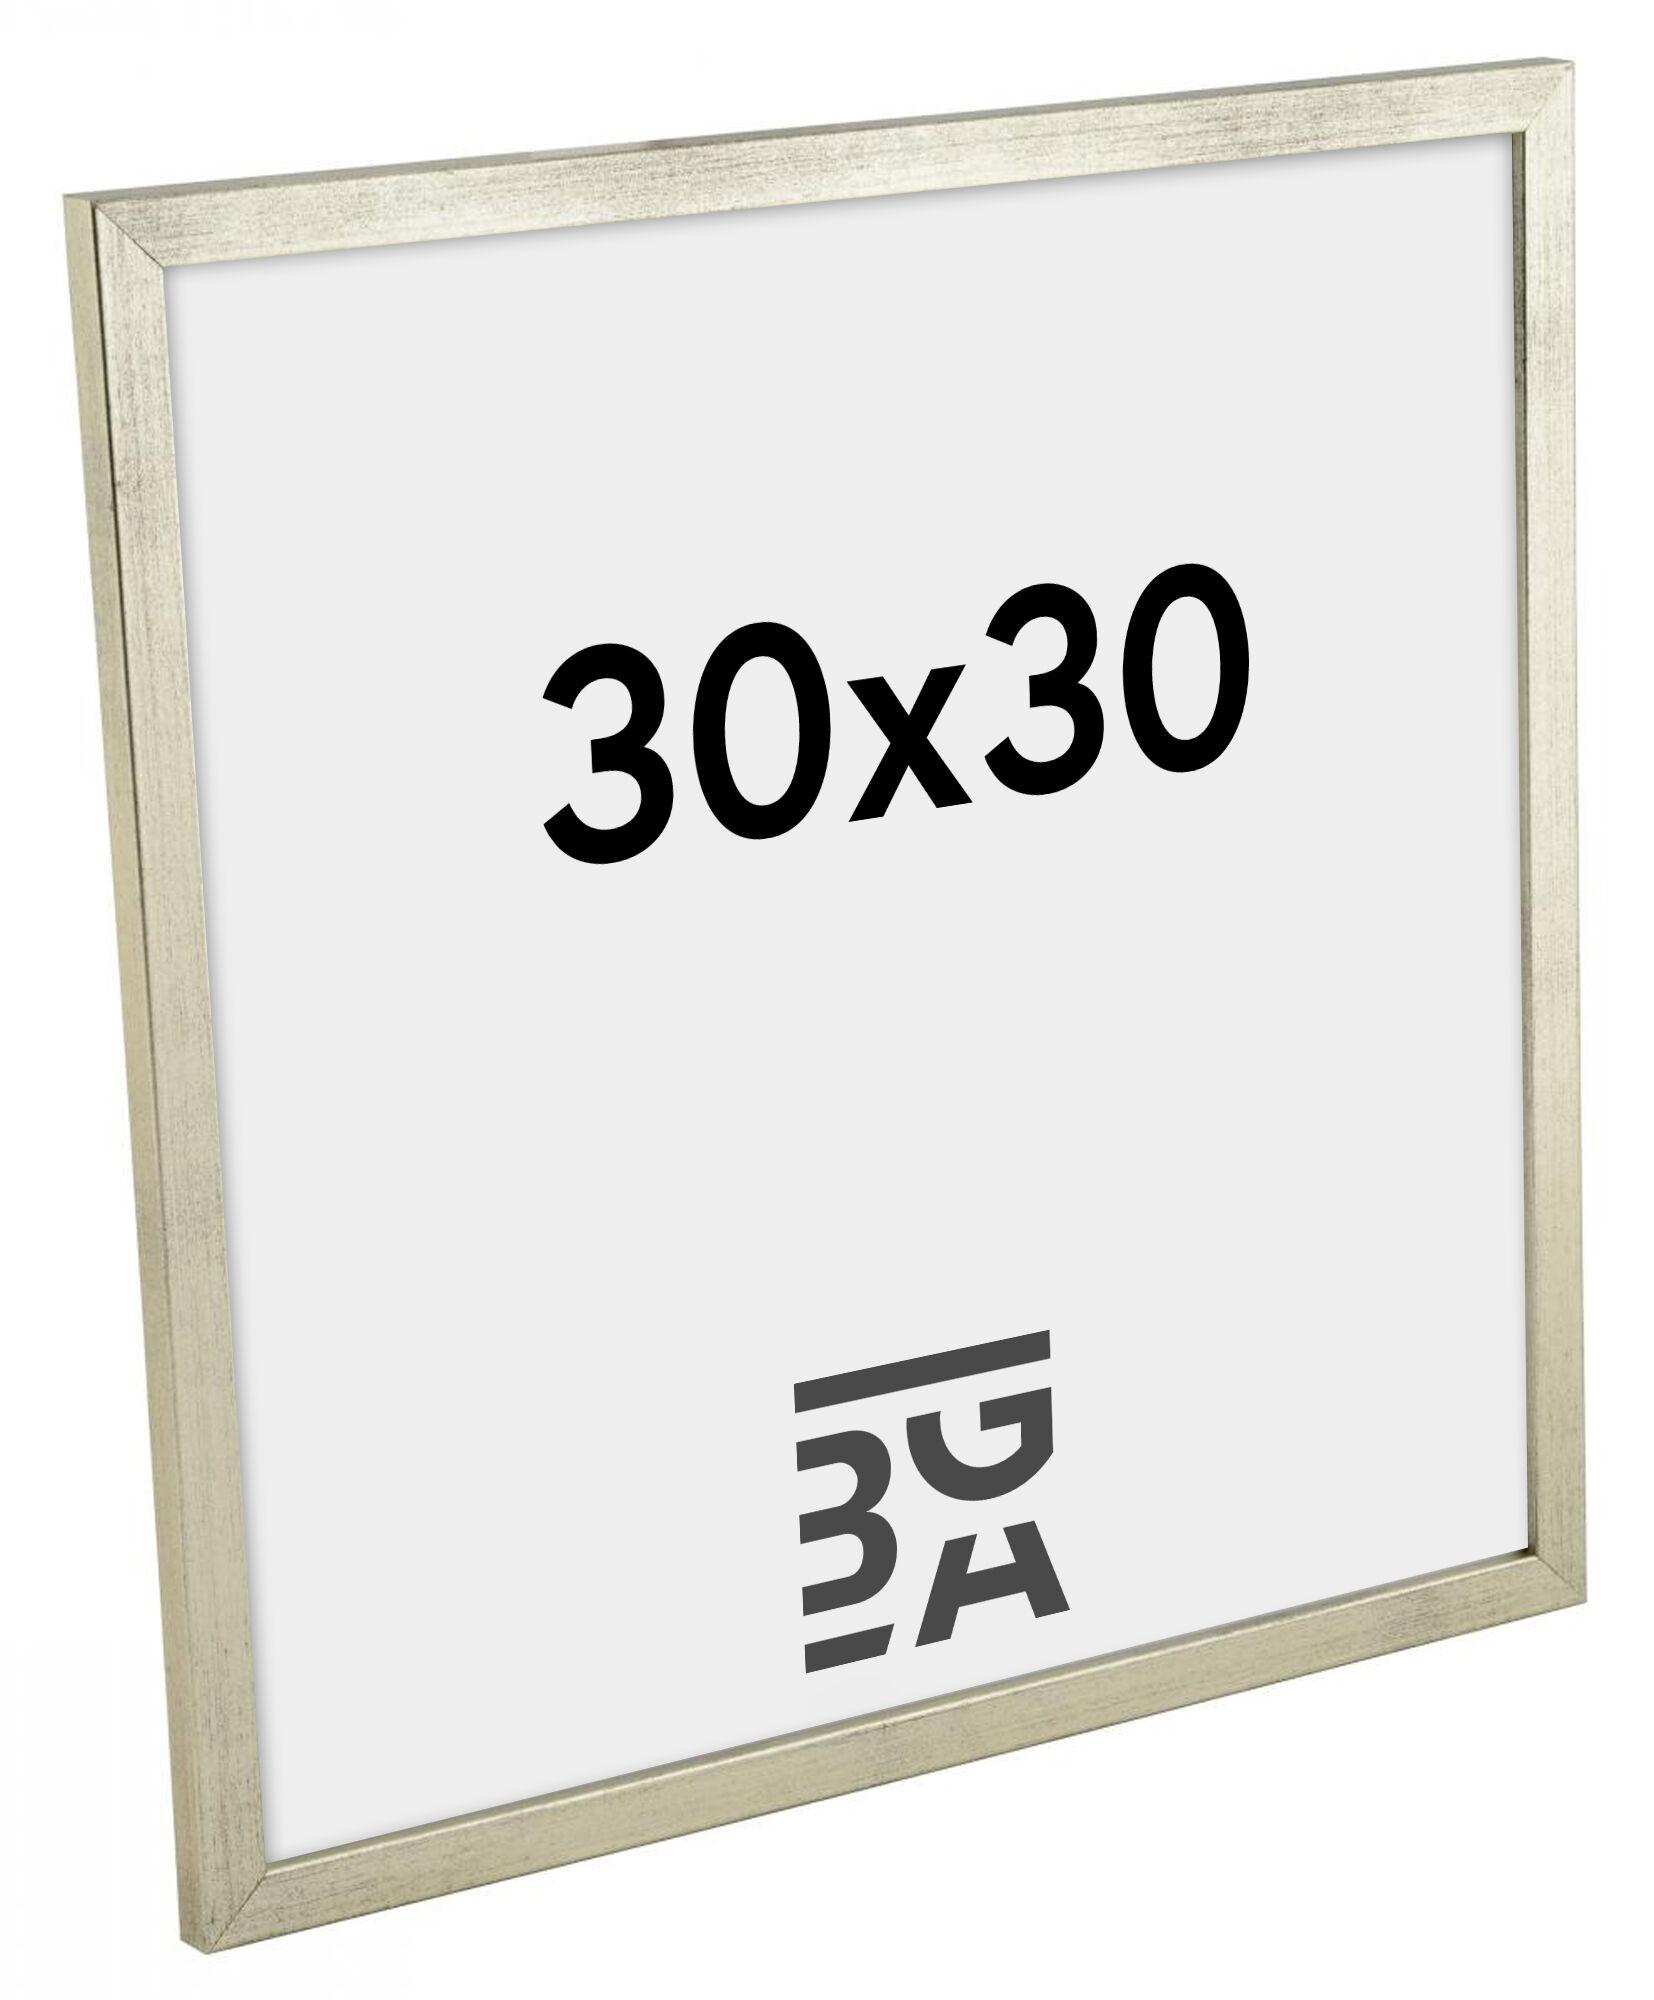 Estancia Galant Hopeanvärinen 30x30 cm